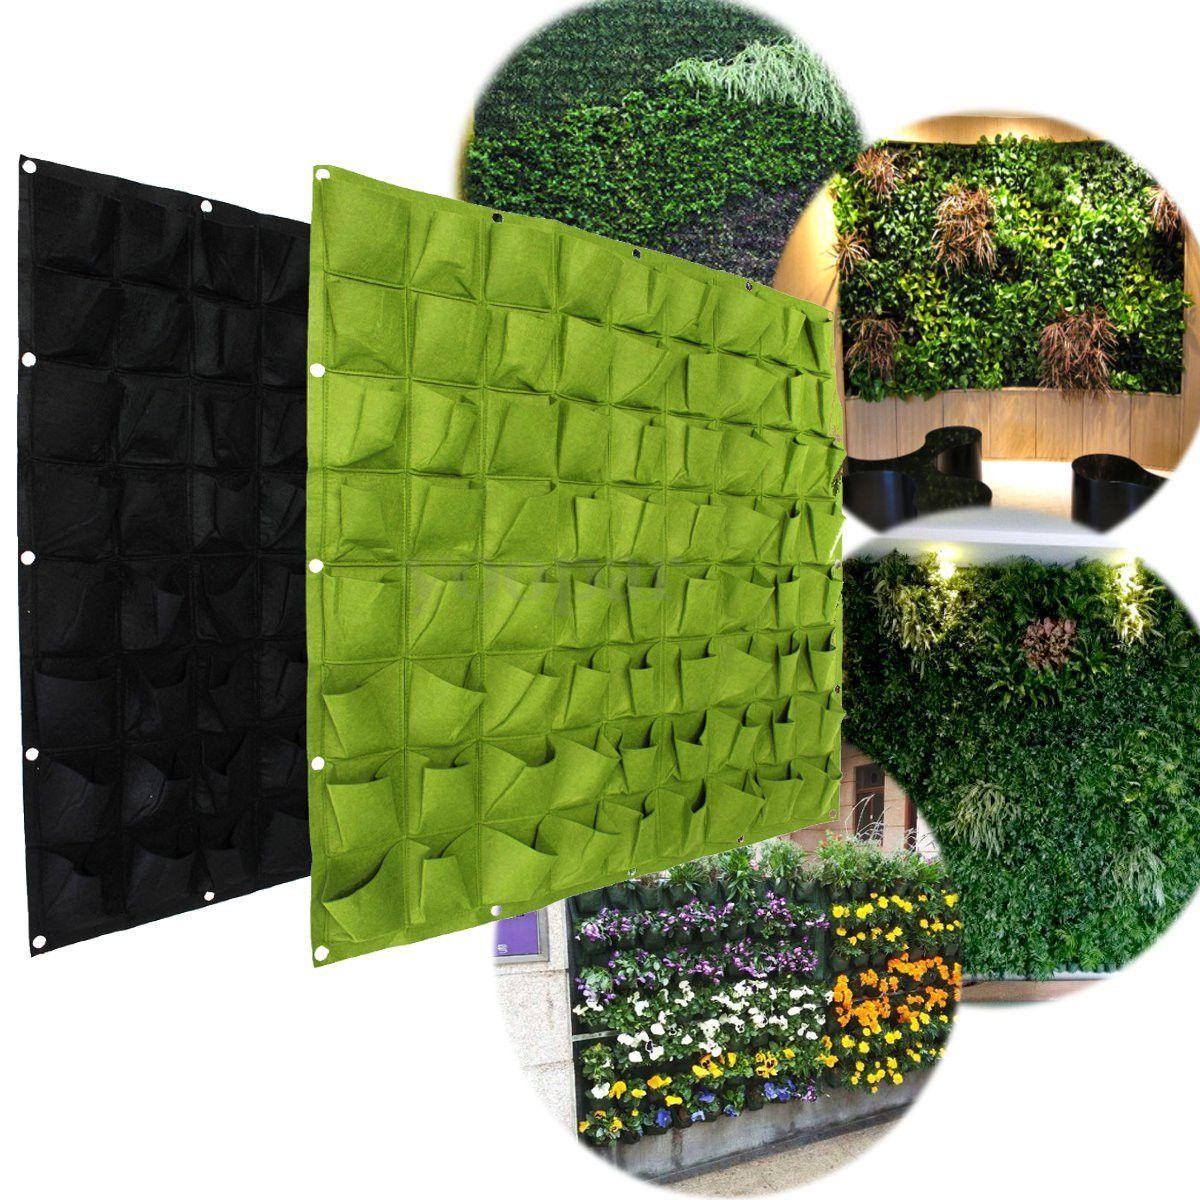 72 Wall Pockets Hanging Garden Wall Flower Planter Bag Indoor/Outdoor Herb  Pot Living Indoor Wall Planter Garden Supplies Decor In Flower Pots U0026  Planters ...